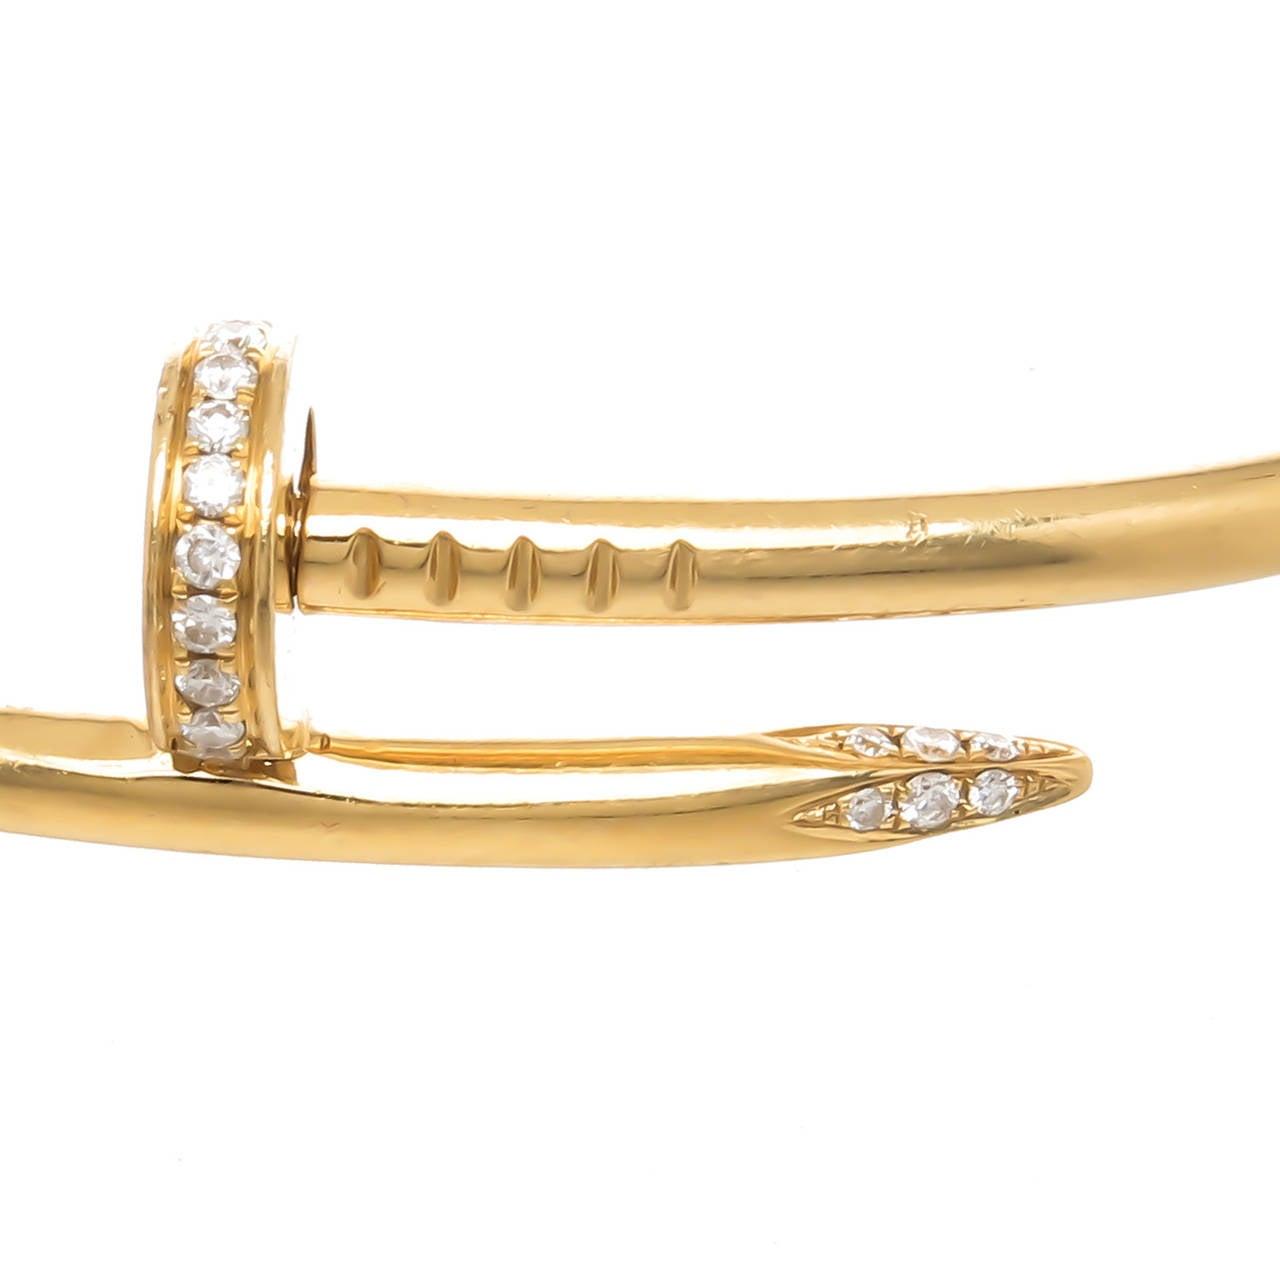 Cartier Juste Un Clou Diamond Gold Nail Bracelet at 1stdibs